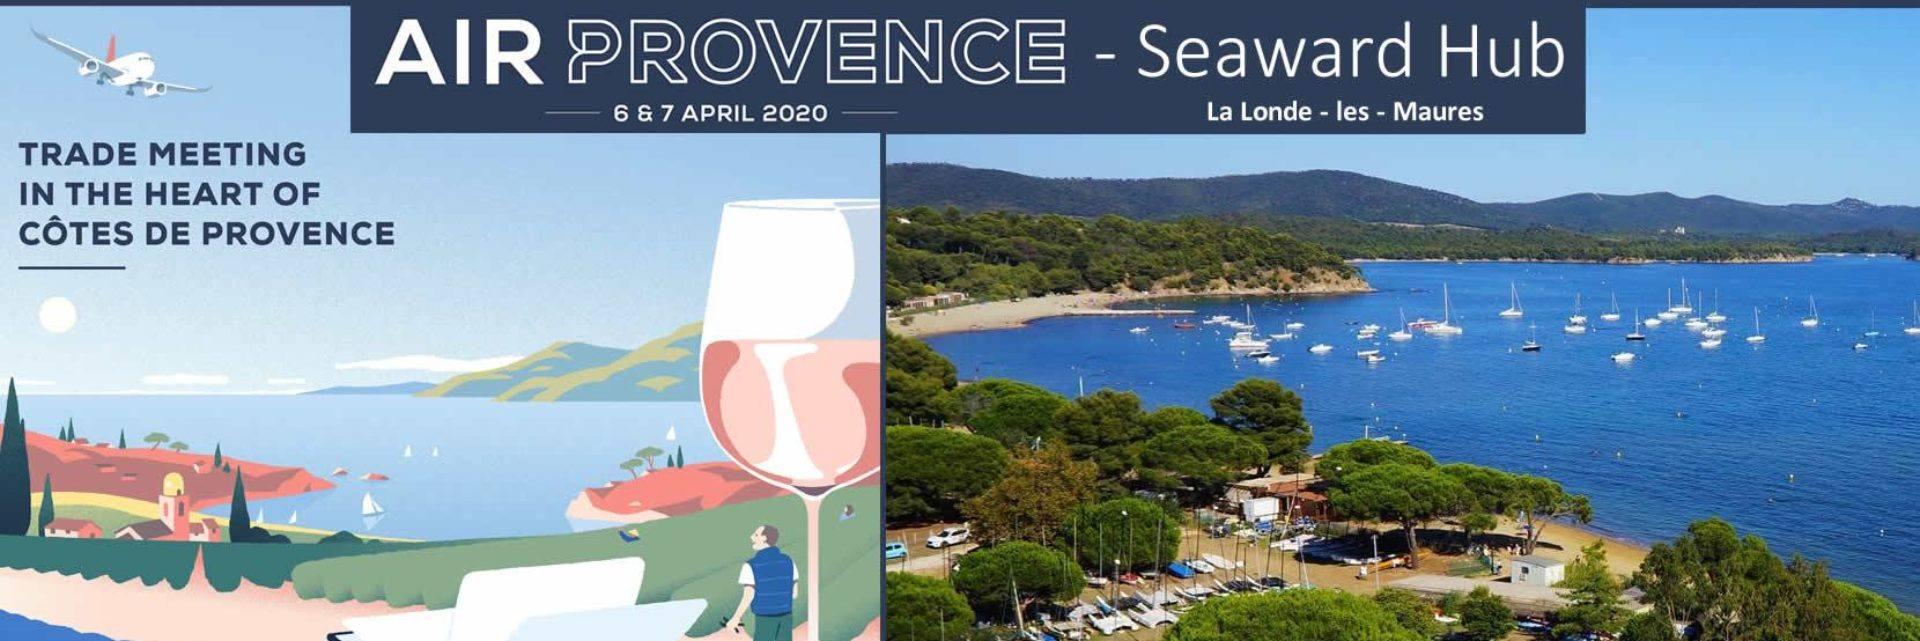 AIR PROVENCE Wine Trade Meeting - Seaward Hub